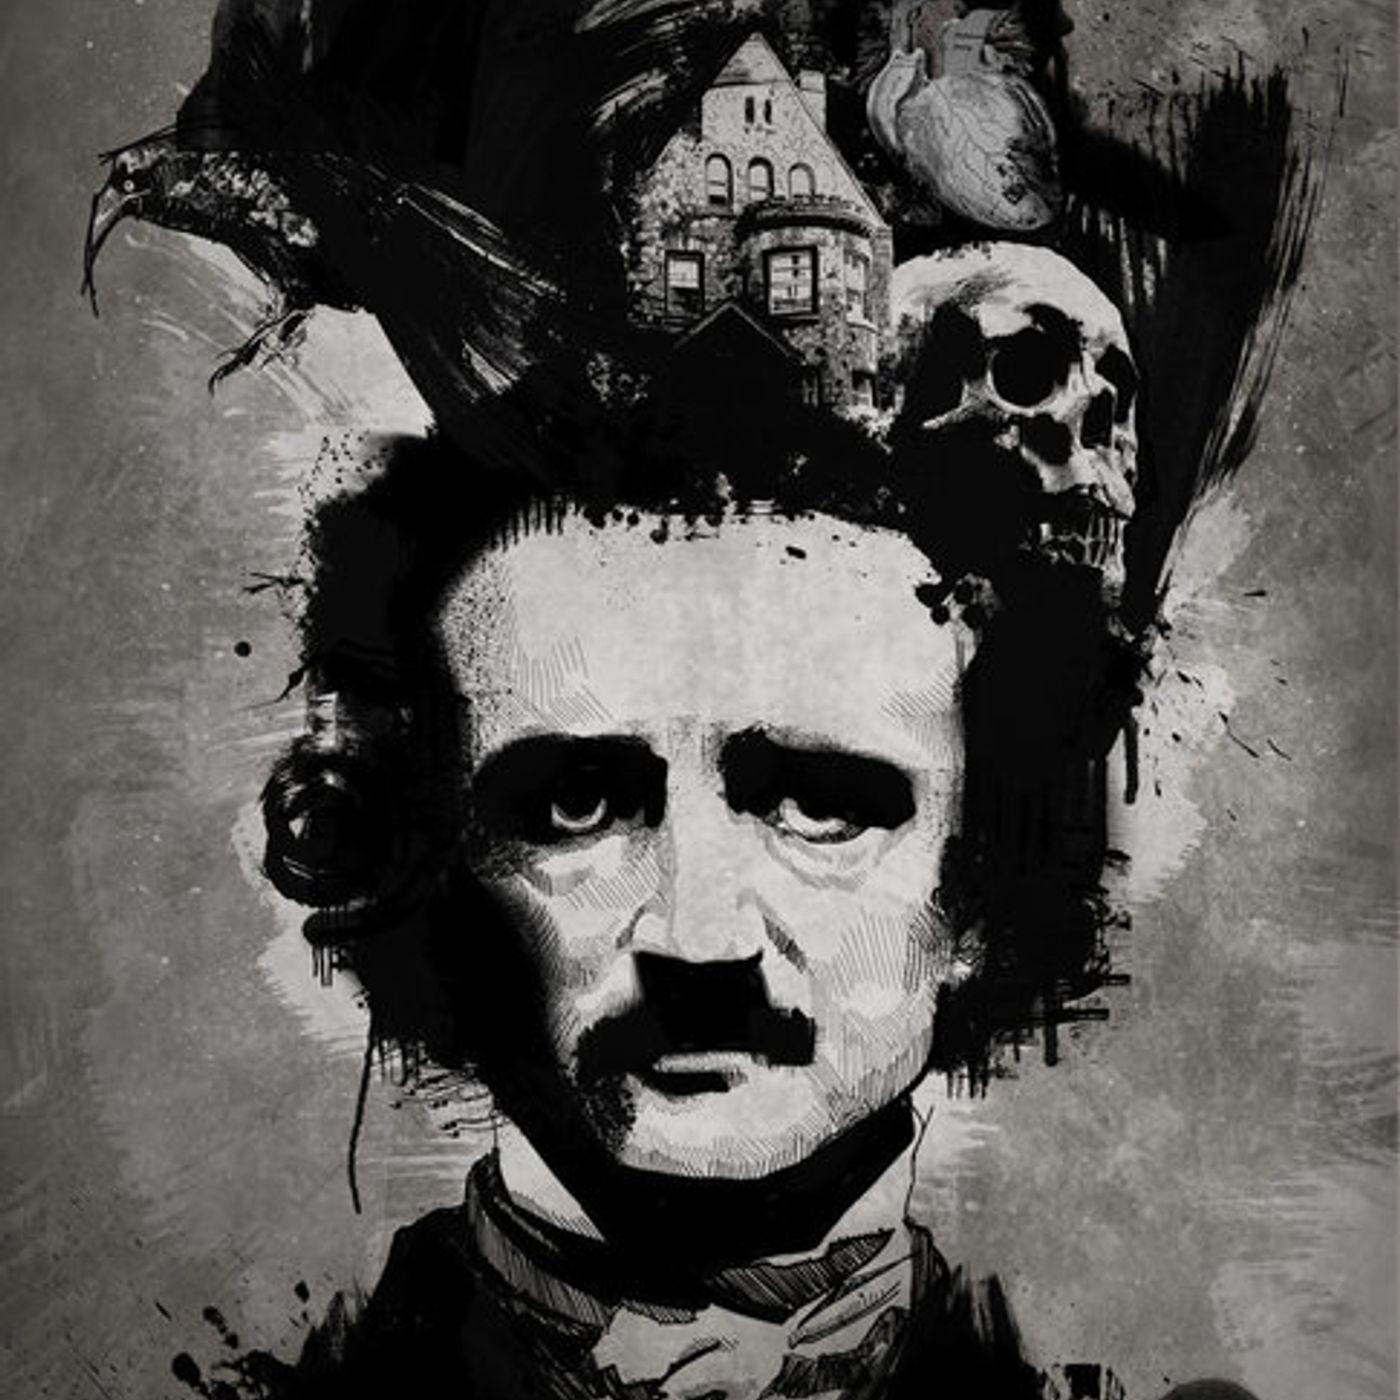 Three Dopes Read The Raven by Edgar Allan Poe